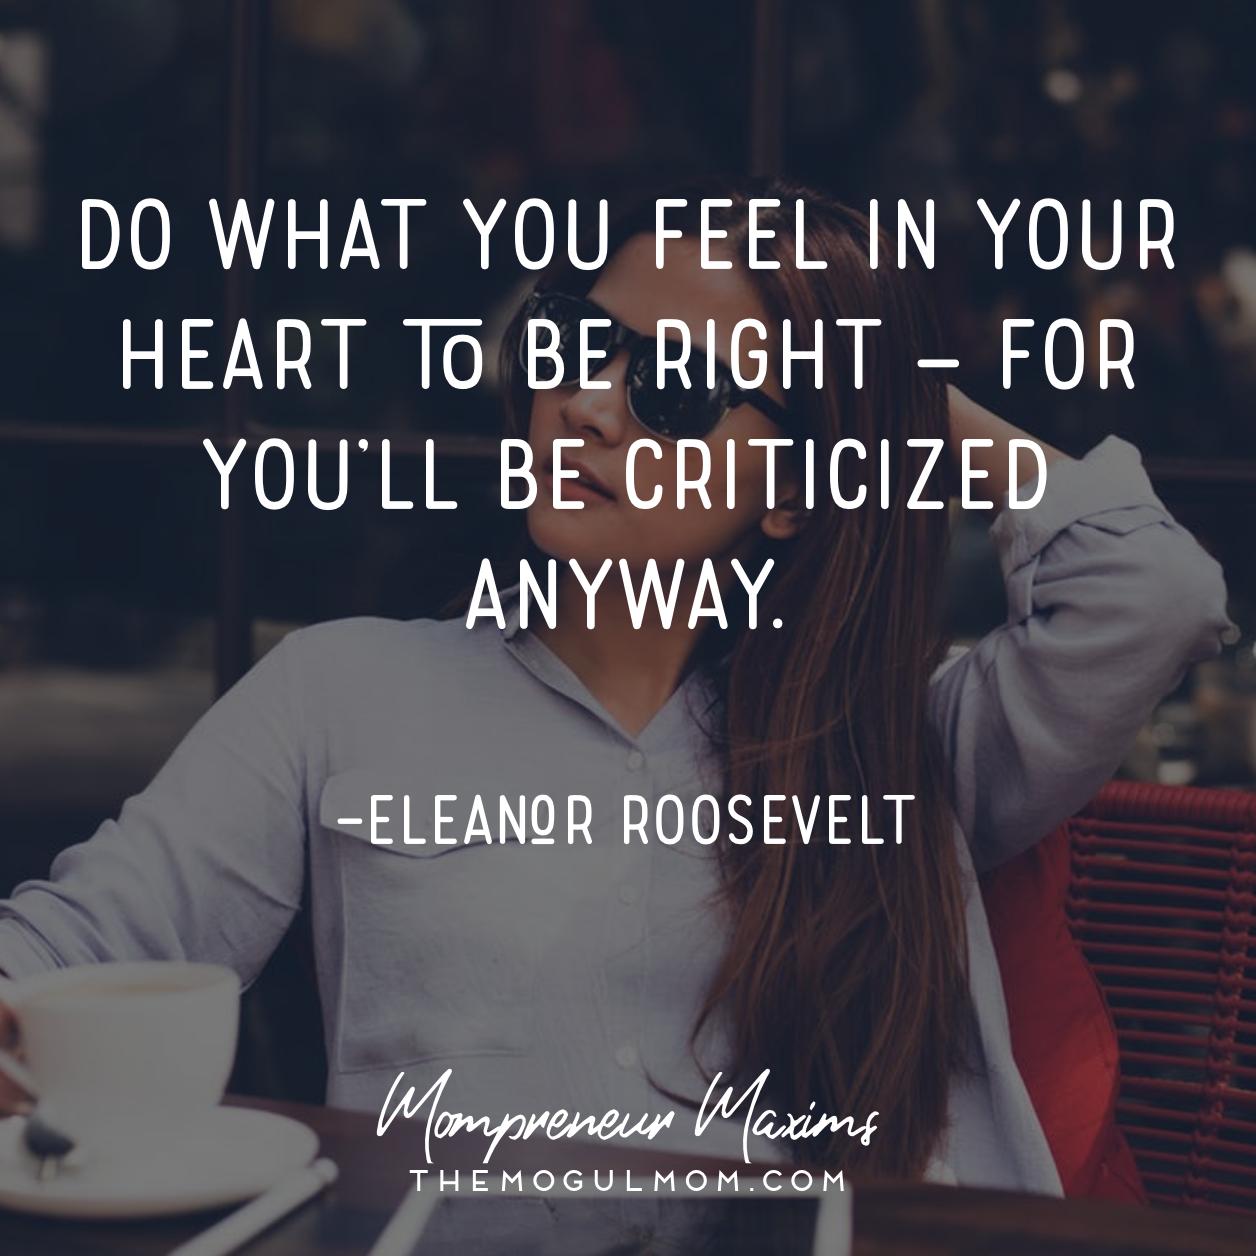 Inspiring Quotes Eleanor Roosevelt: Eleanor Roosevelt Quotes, Roosevelt Quotes And